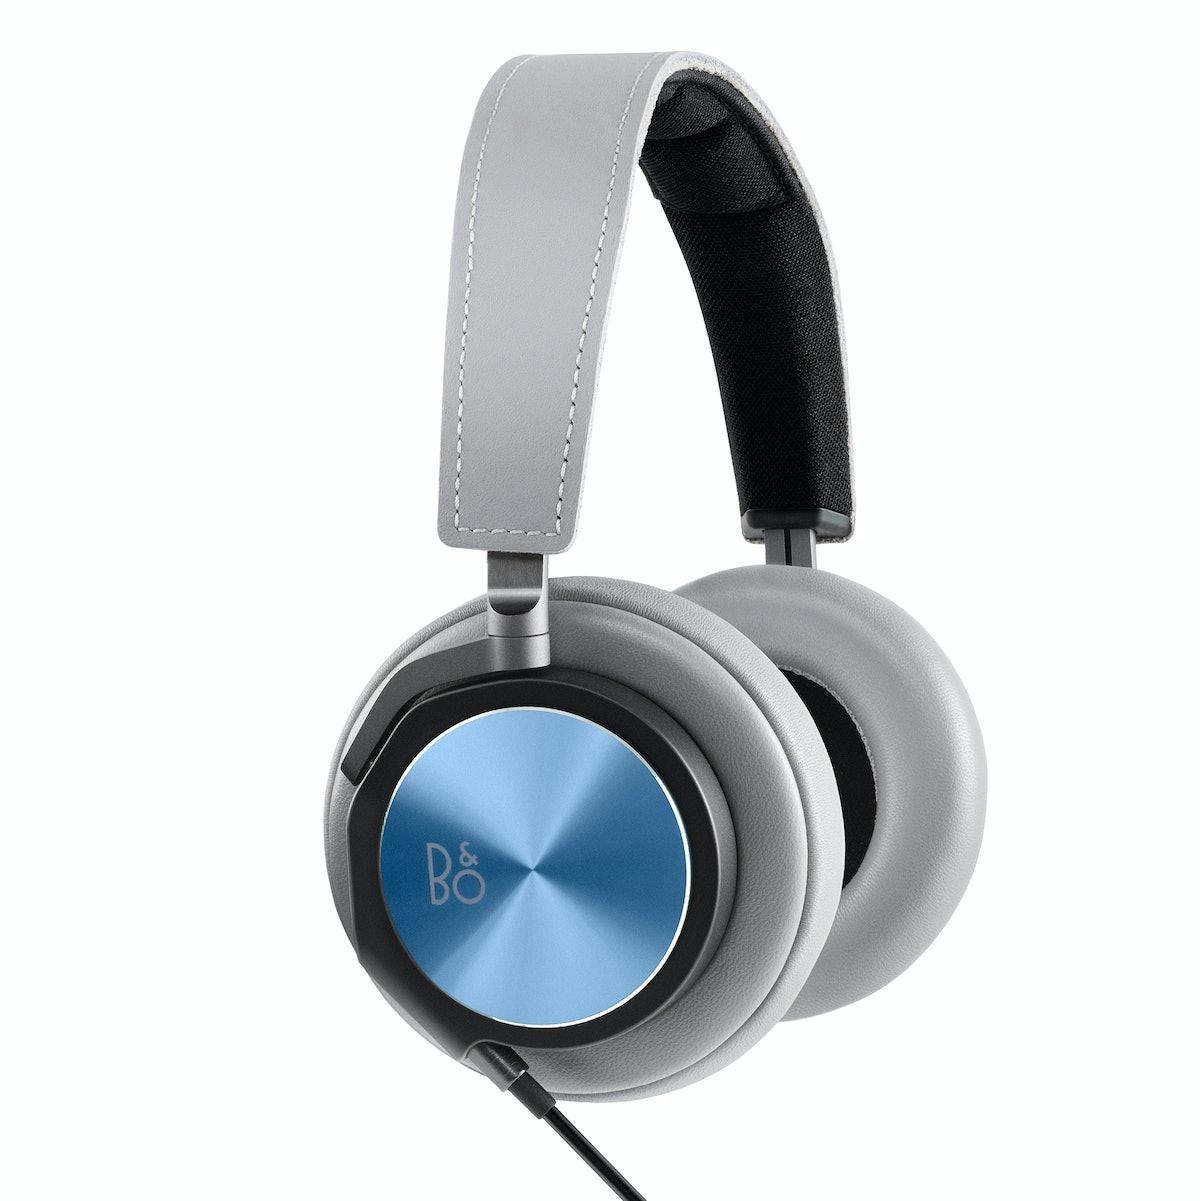 B&O Play special edition headphones